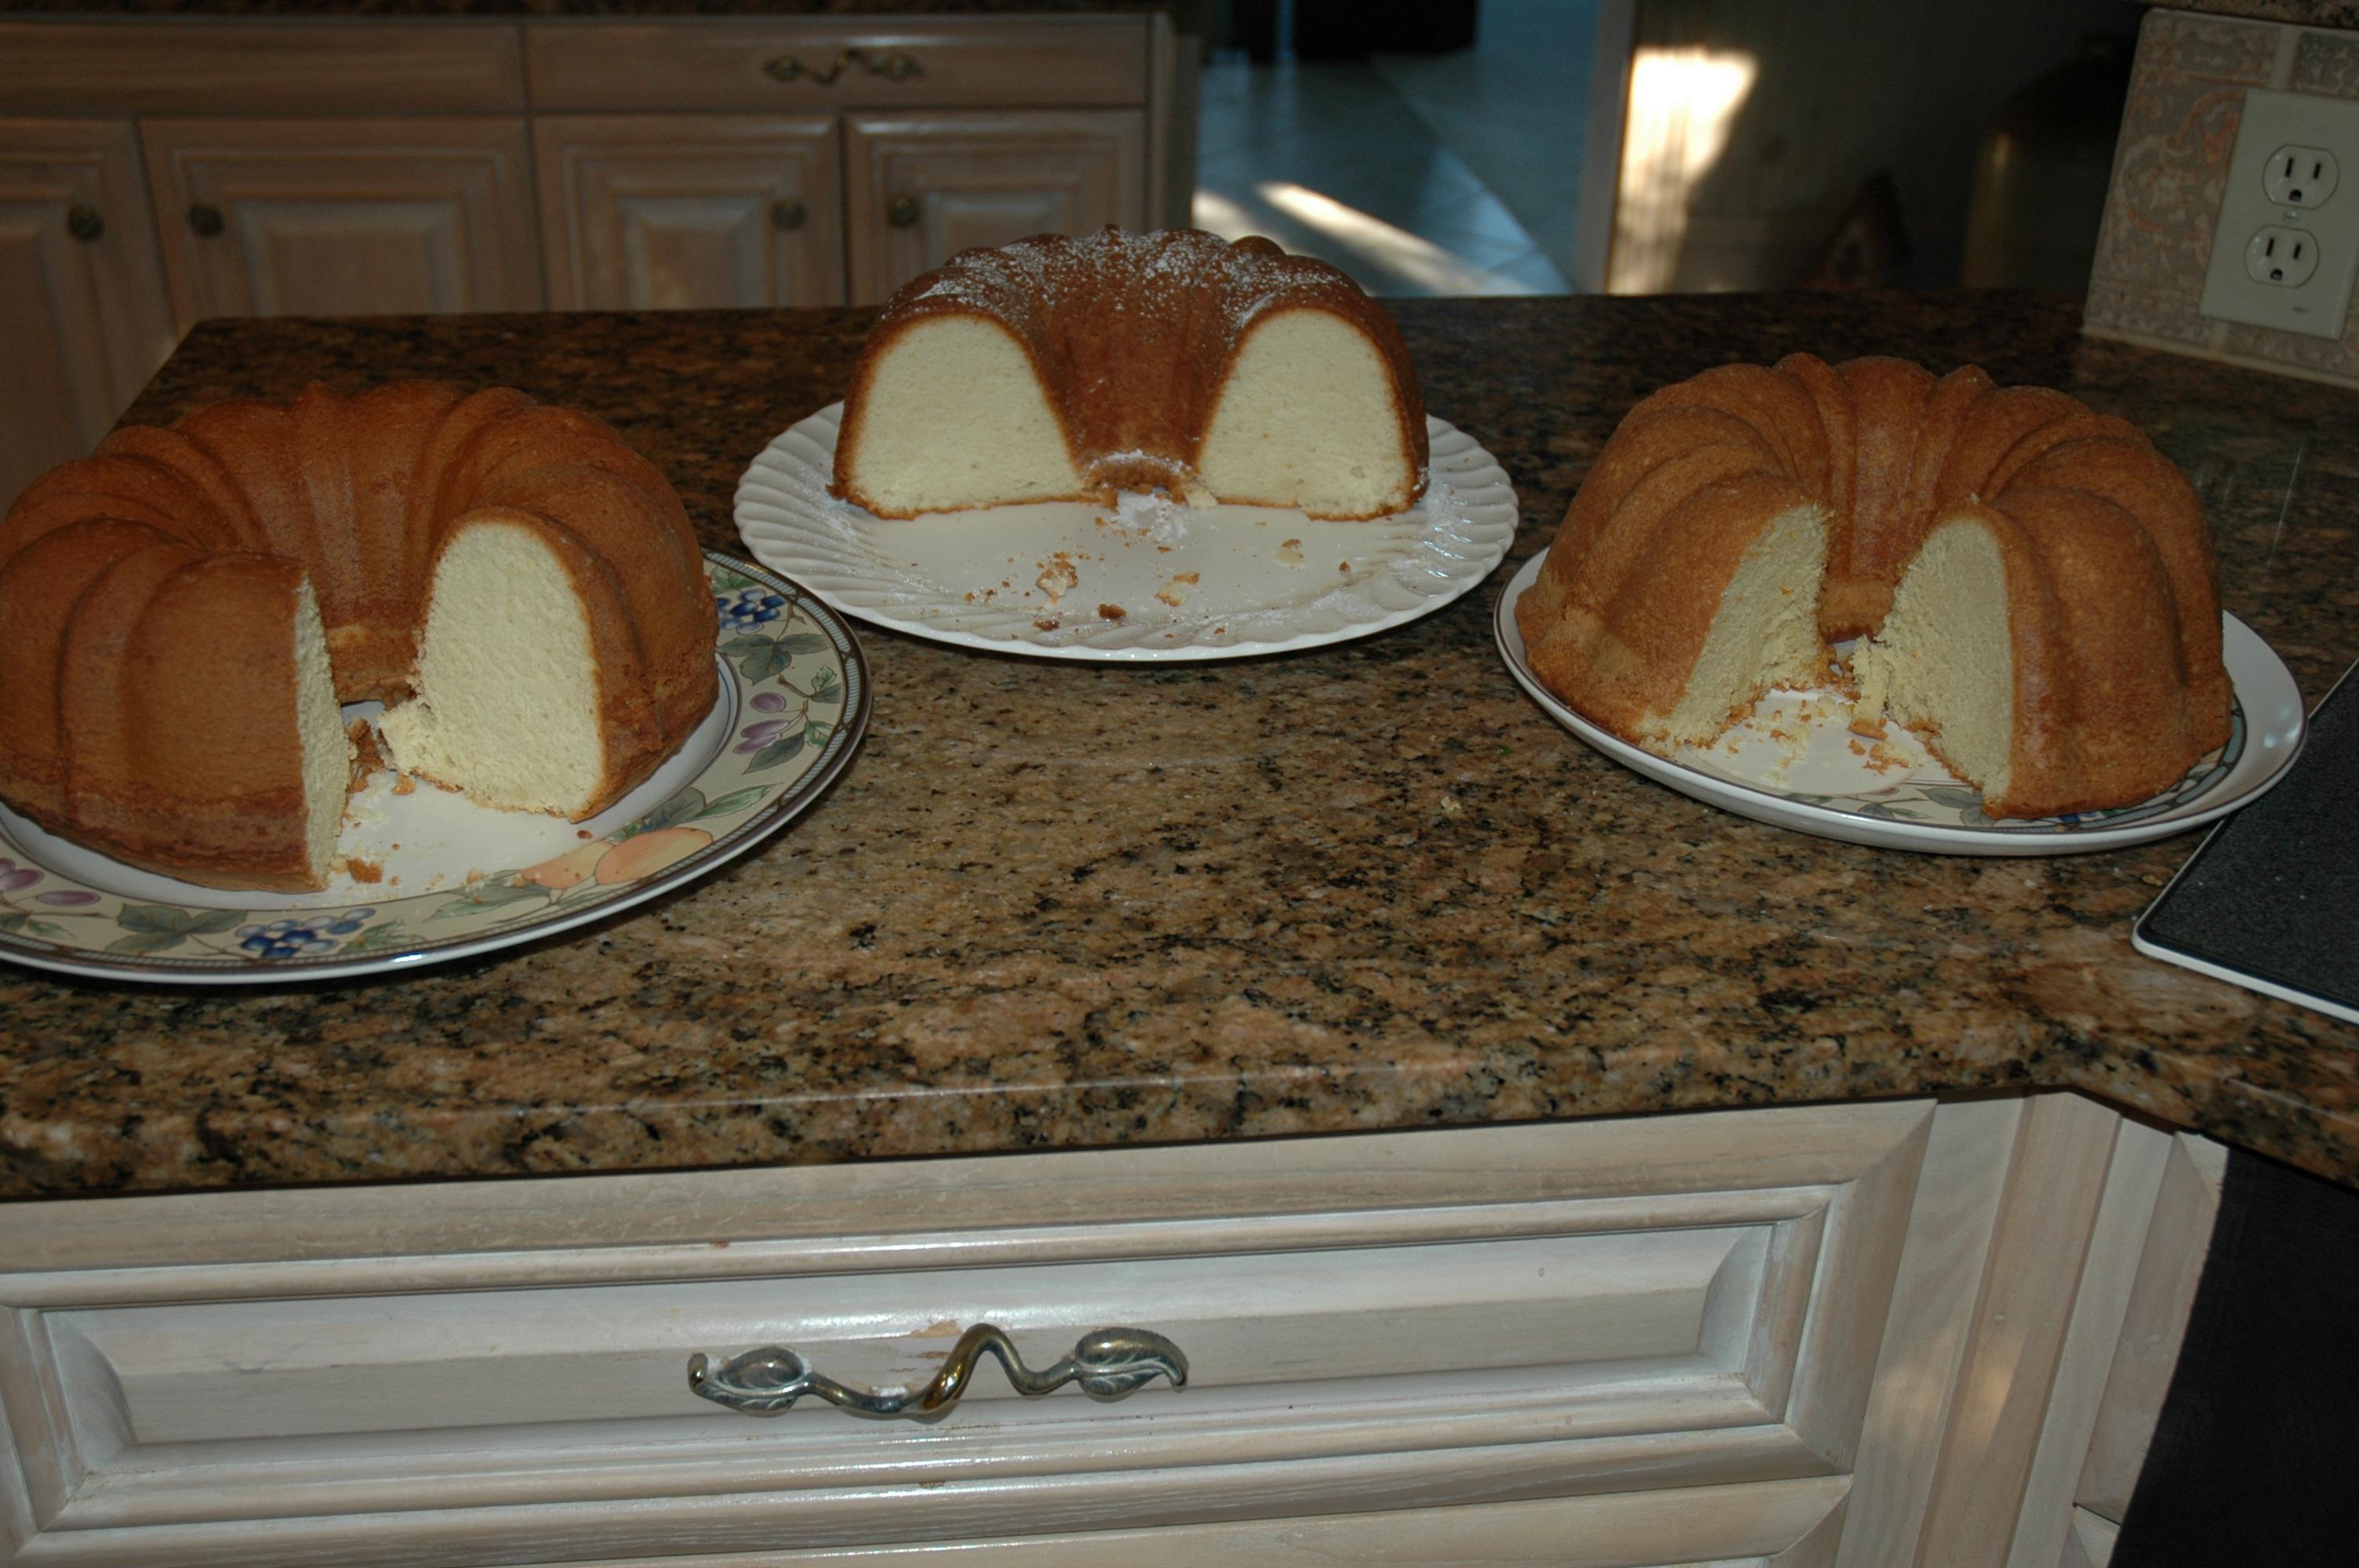 Cream Cheese Pound Cake Recipe Joy Of Baking: Great Smoky Mountains Heritage Center Awards Blue Ribbons